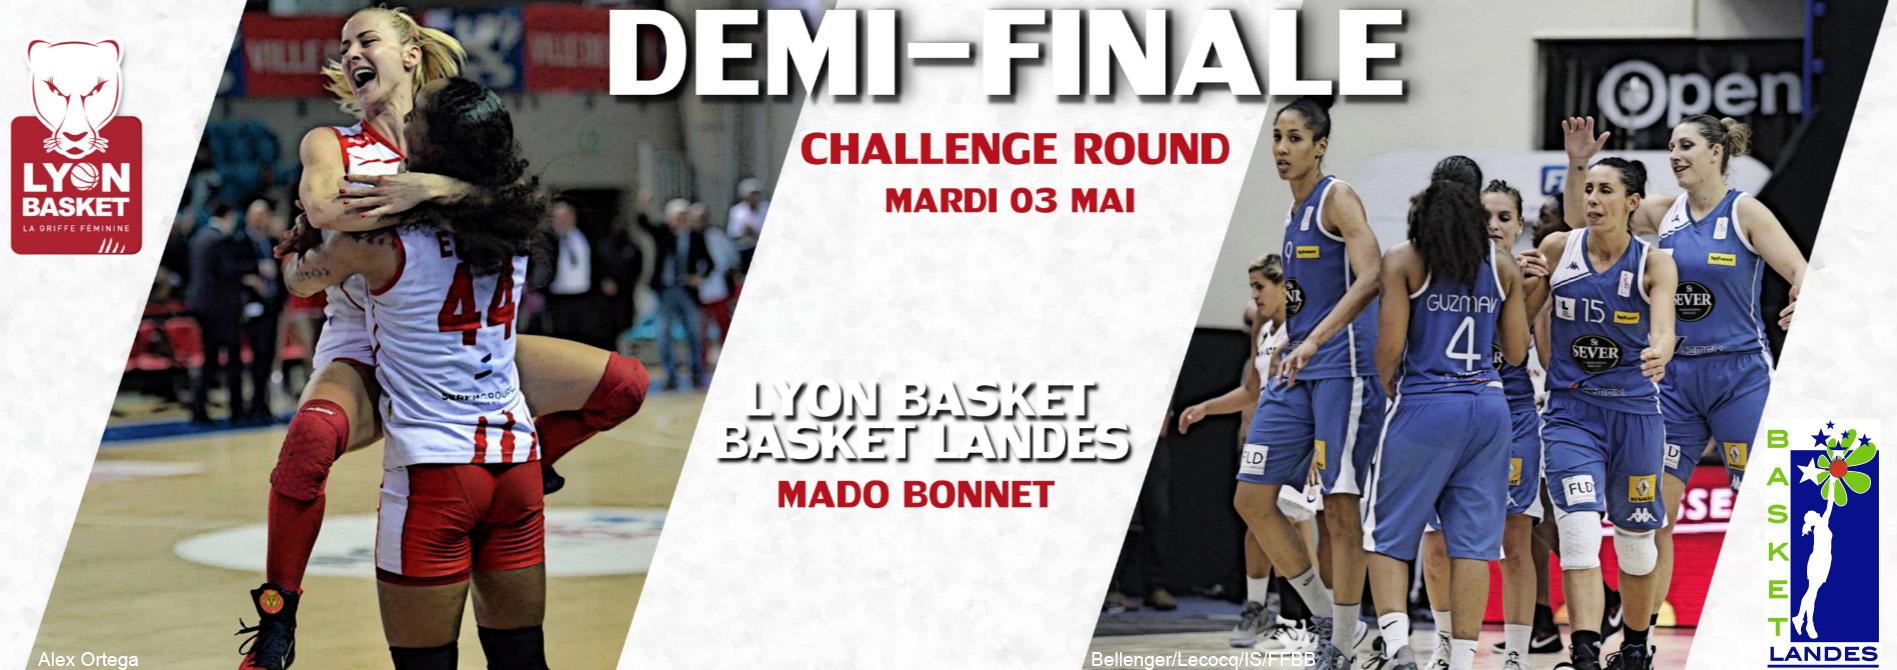 LyonBF-BasketLandes-challengeround